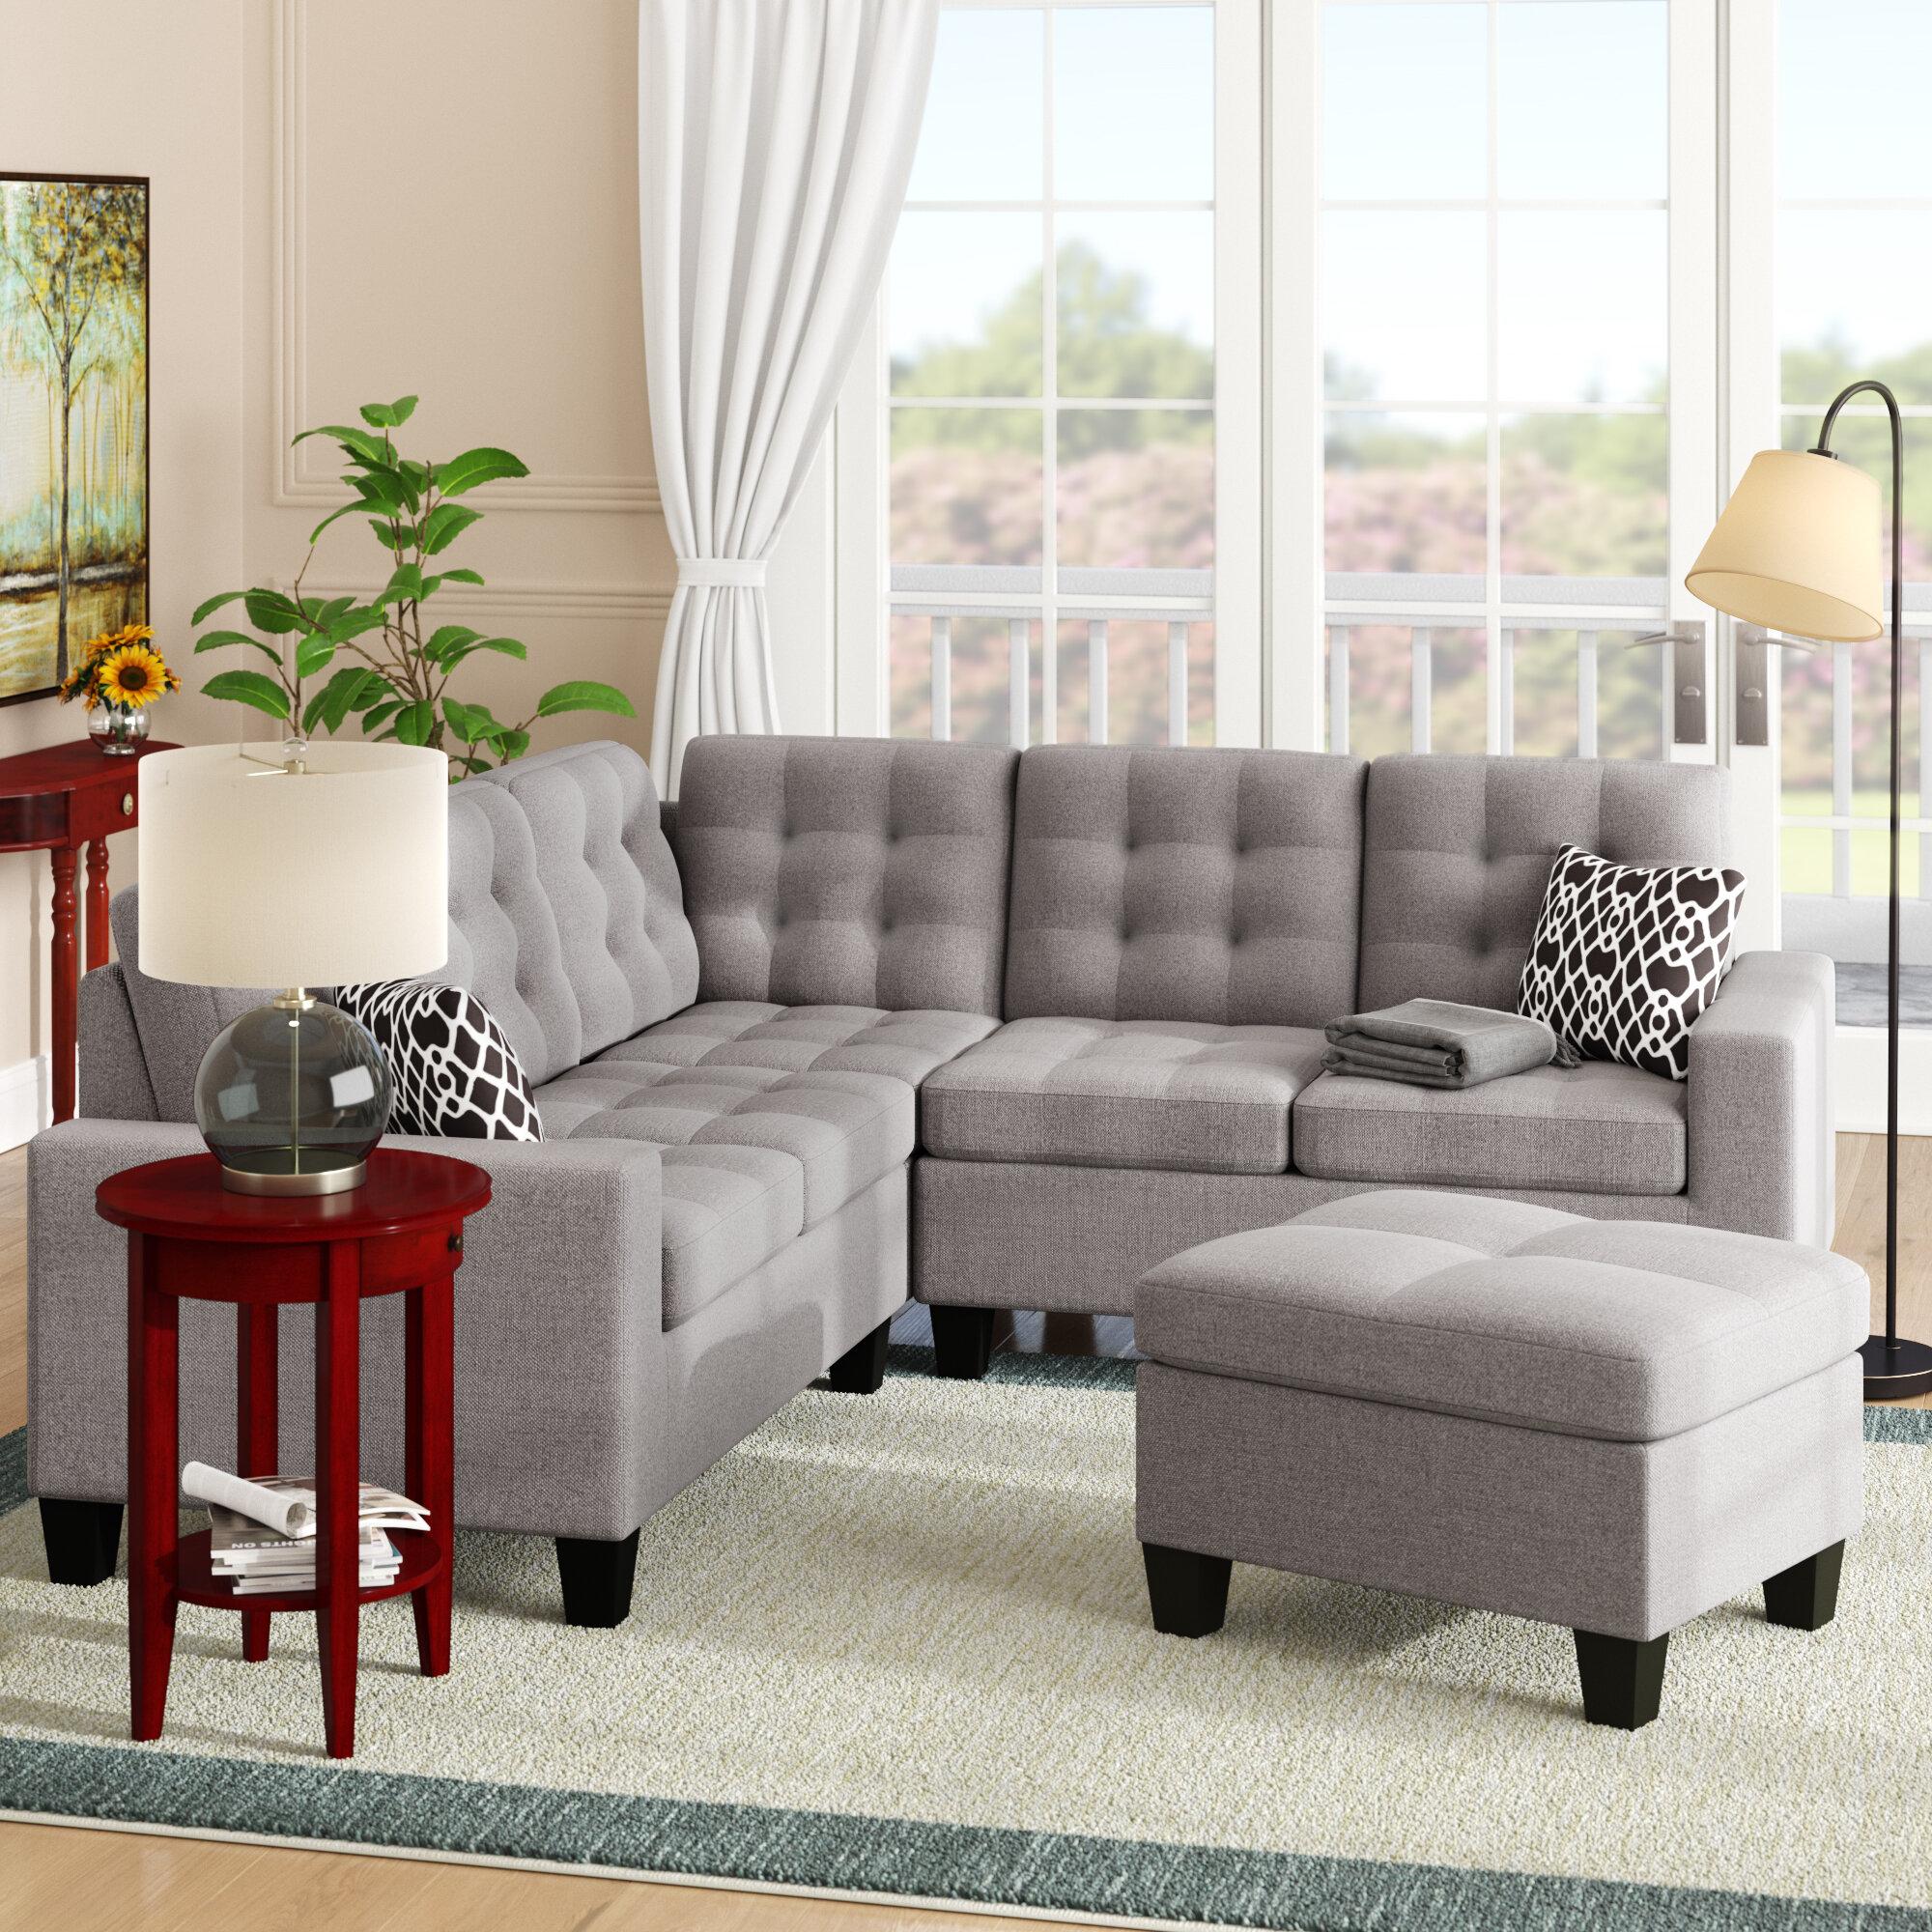 Swell Pawnee Symmetrical Sectional With Ottoman Uwap Interior Chair Design Uwaporg